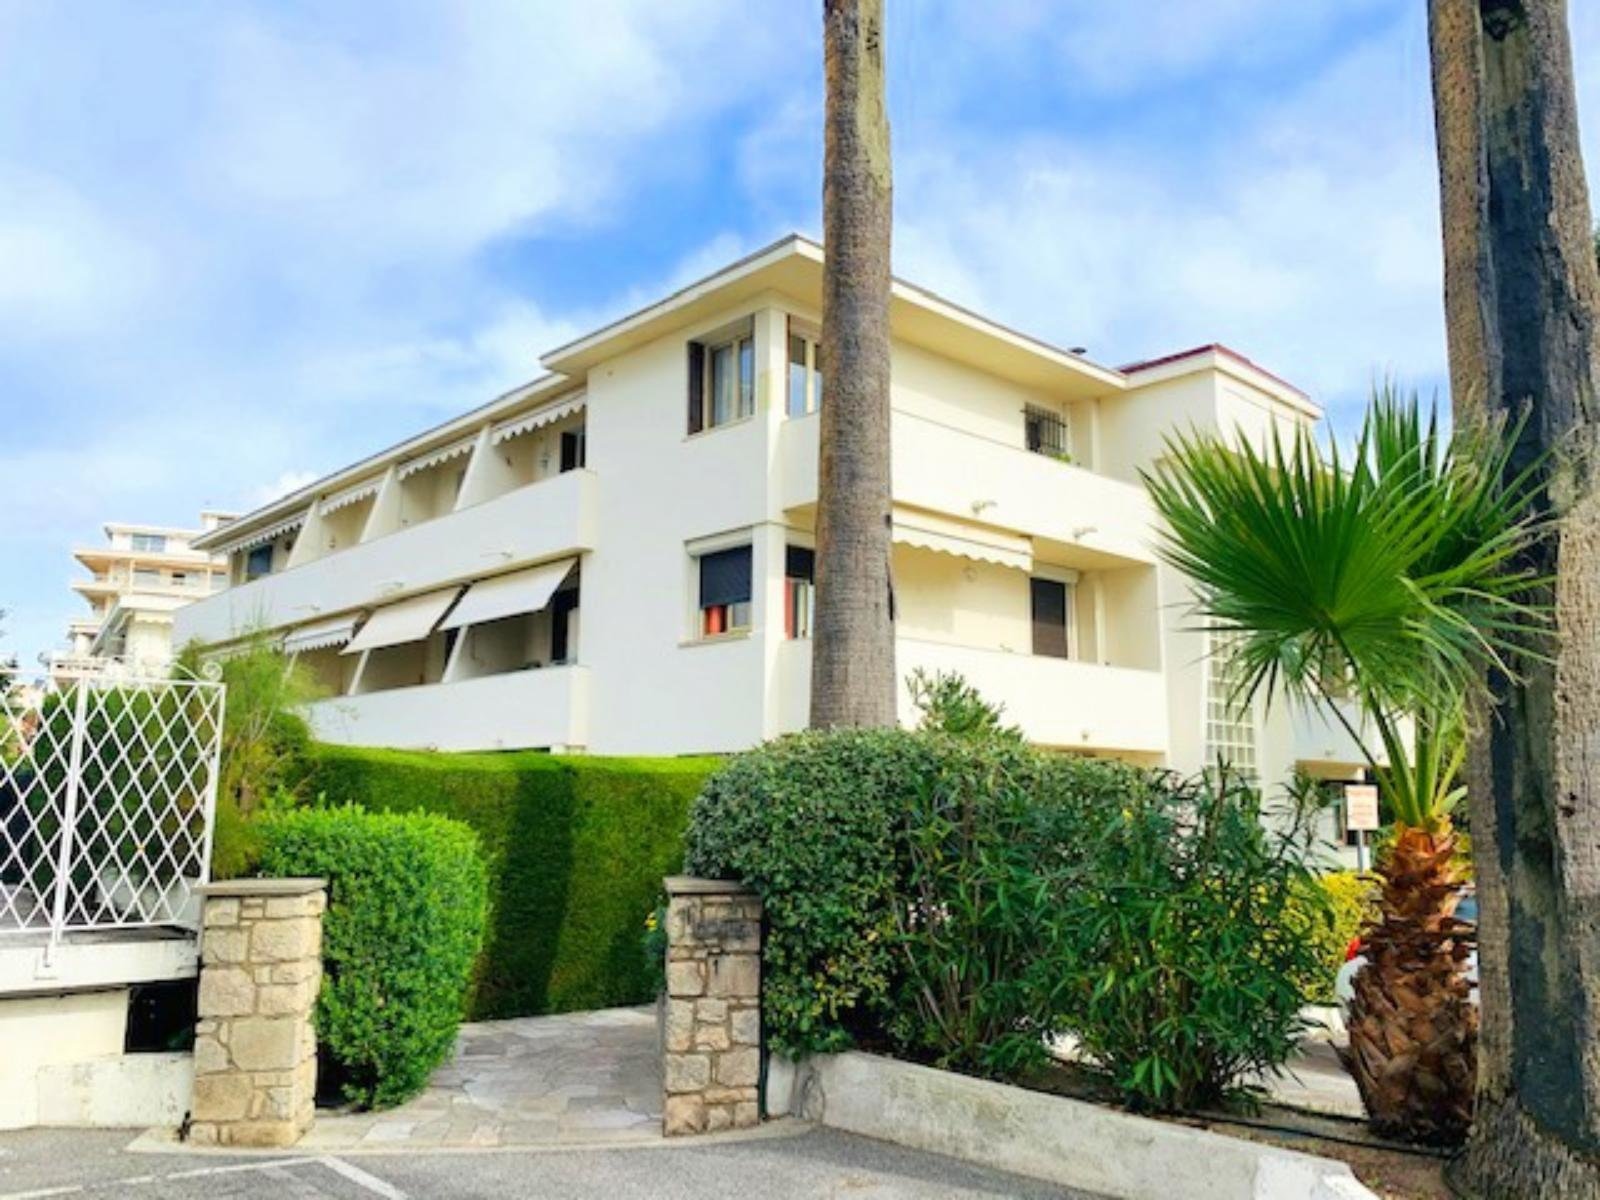 A Vendre, Studio avec jardin, Cannes Palm Beach